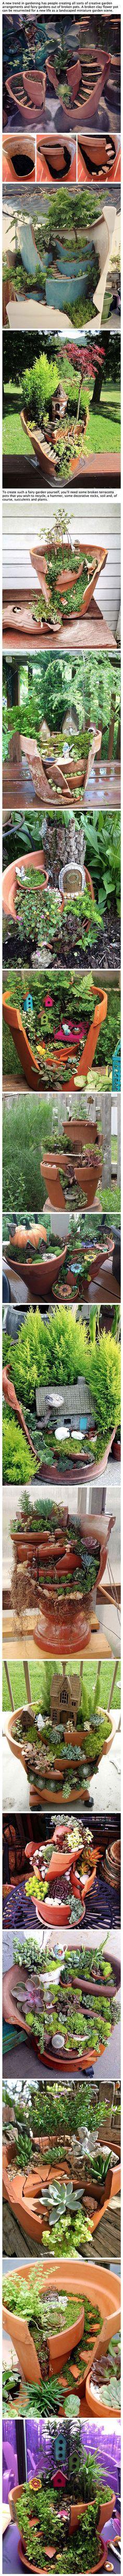 Broken Pots Turned Into Beautiful Fairy Gardens.